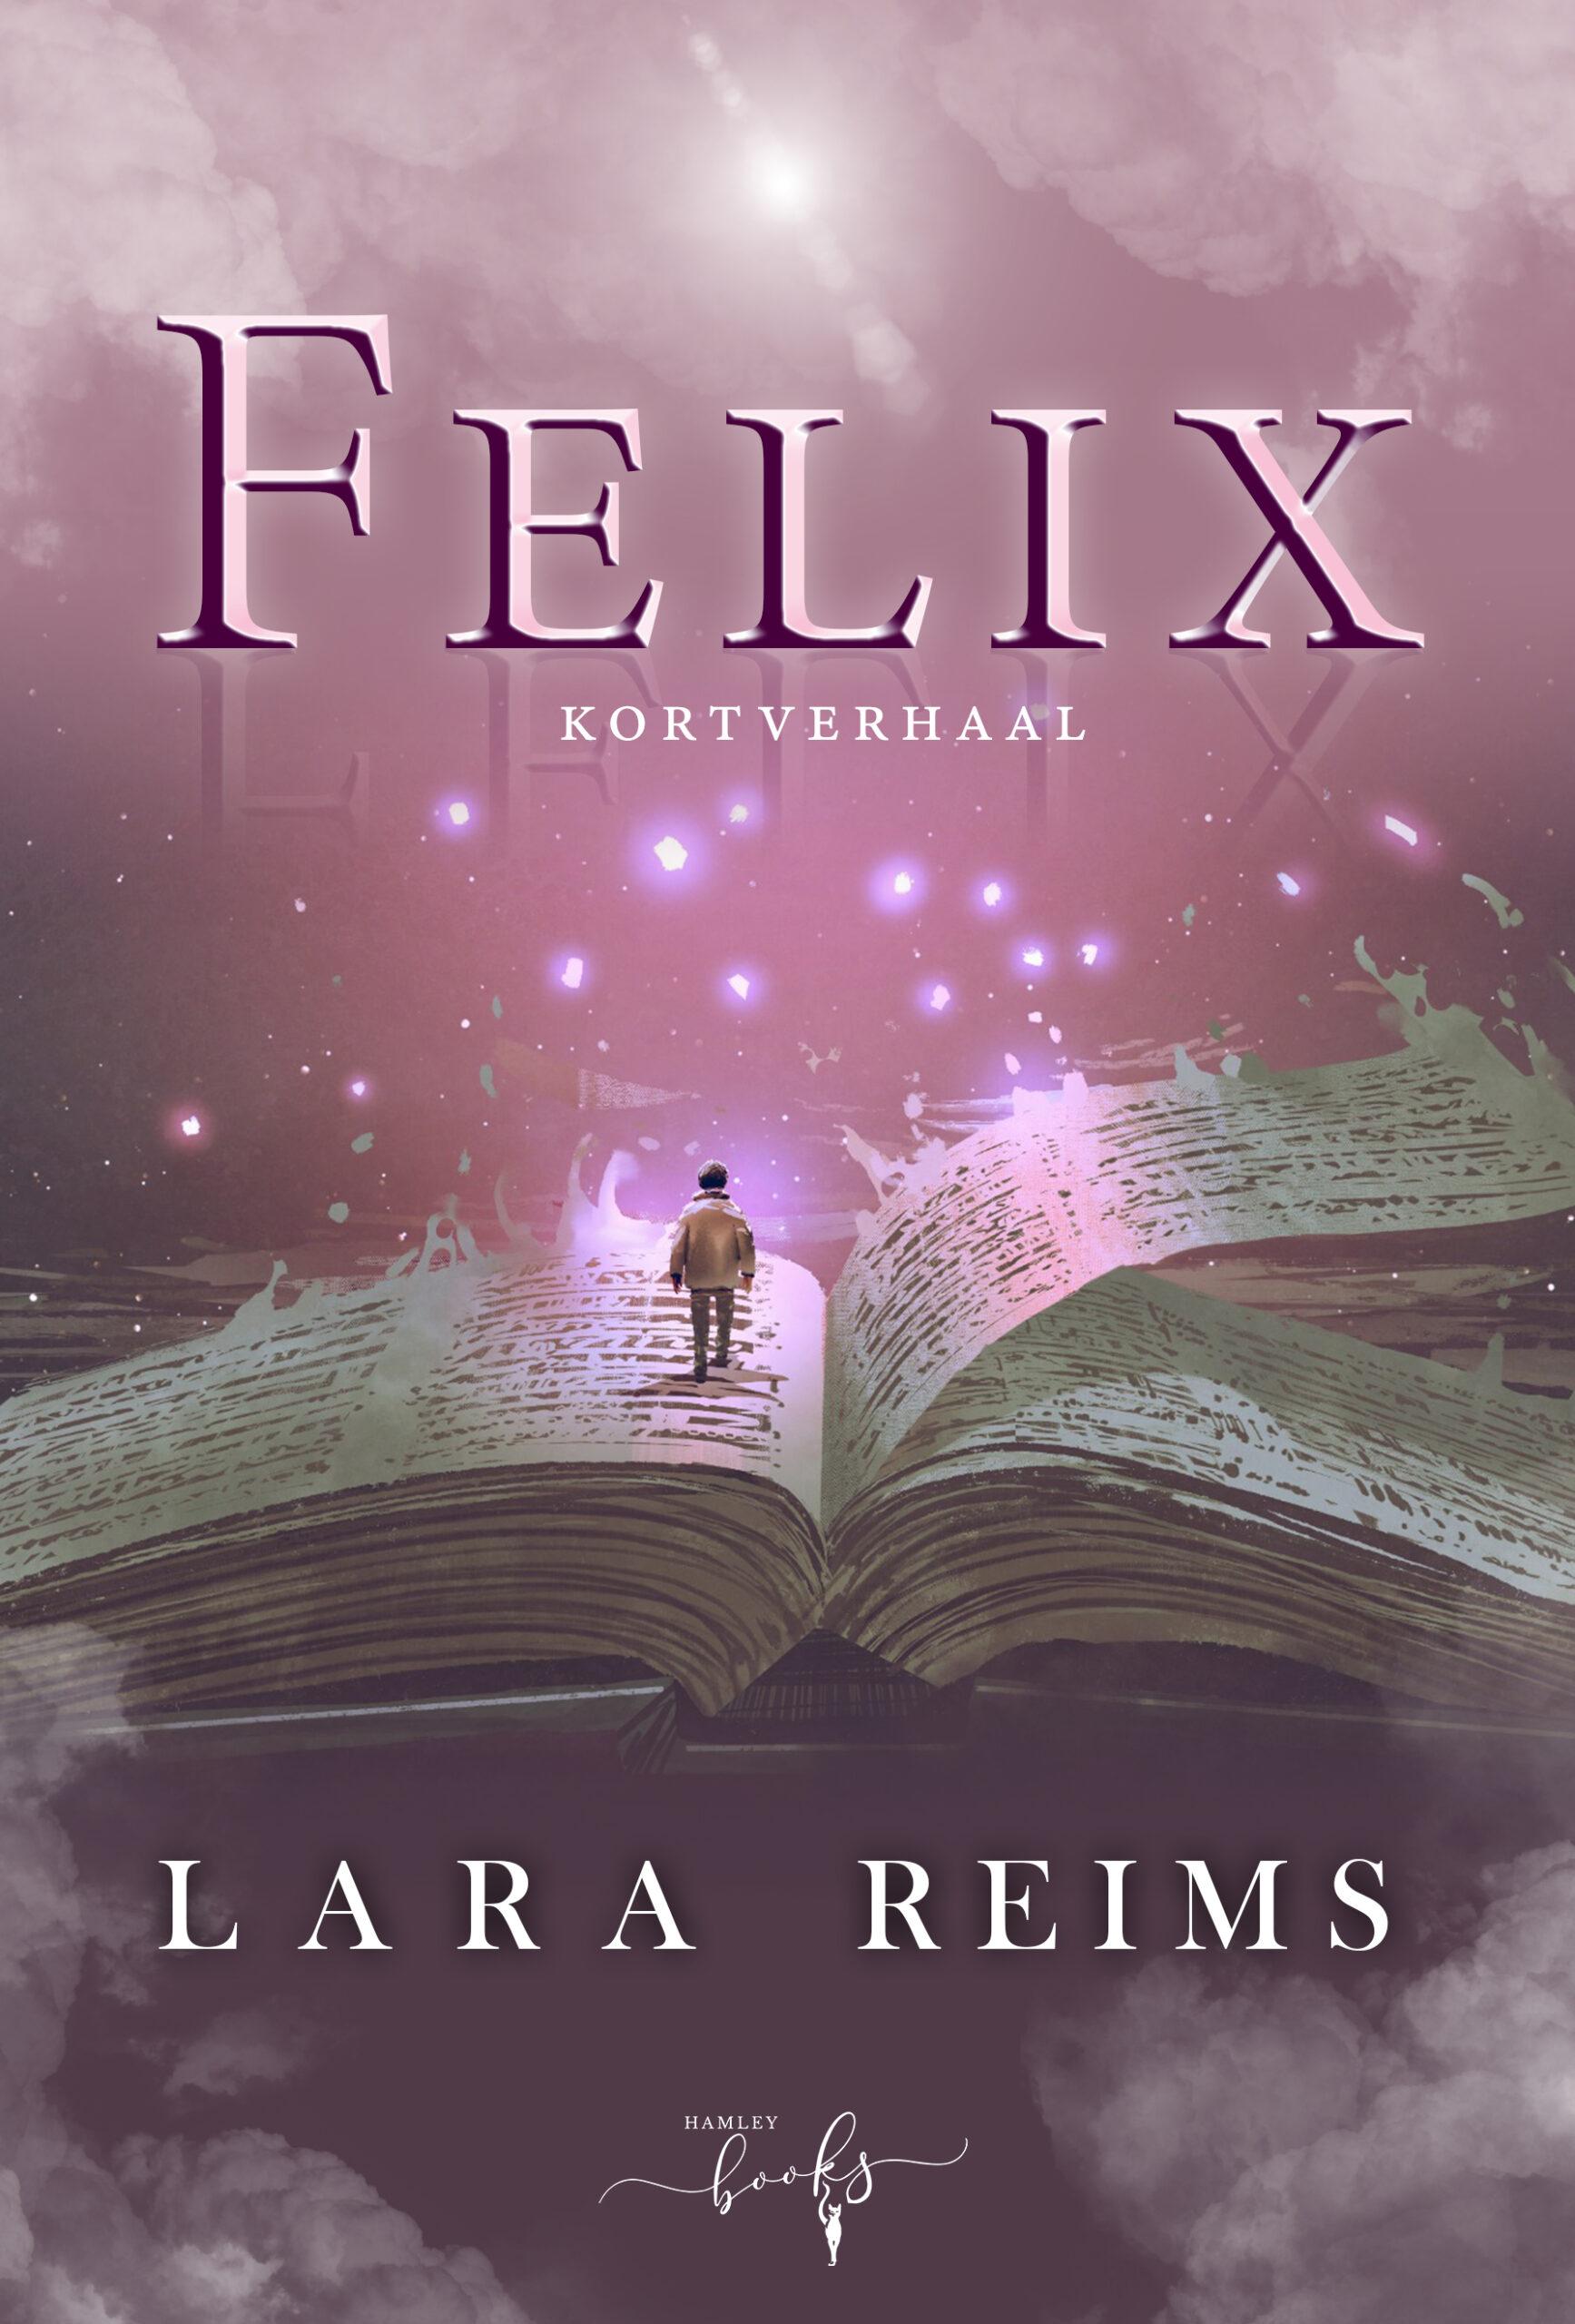 felix_larareims_kortverhalen_hamleybooks